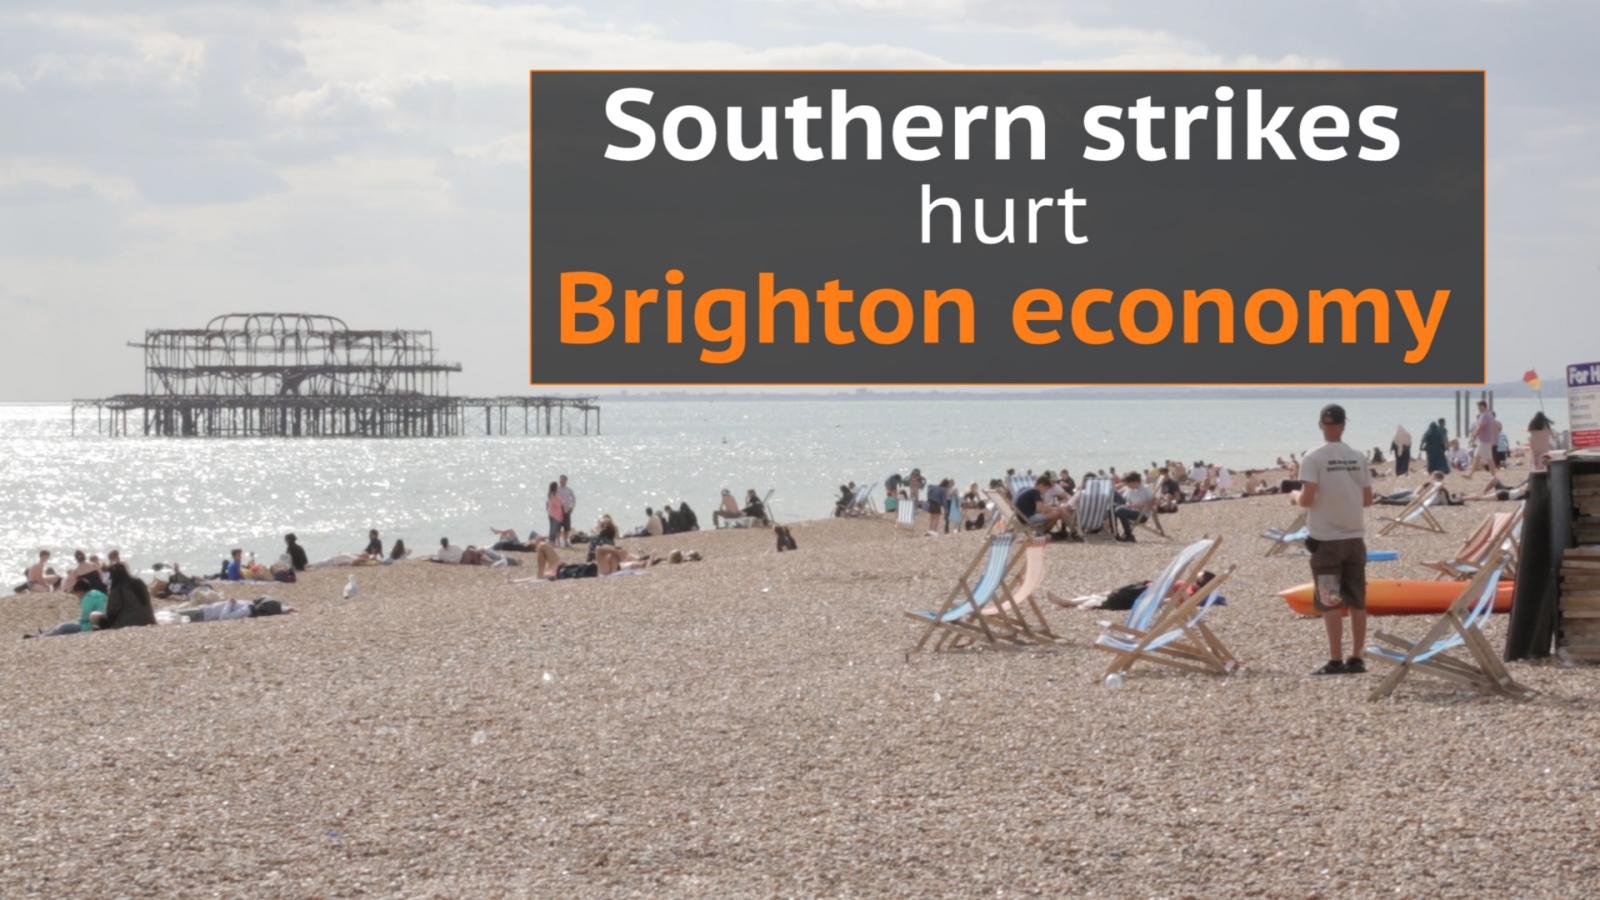 Southern rail strike: Brighton economy suffering due to travel chaos